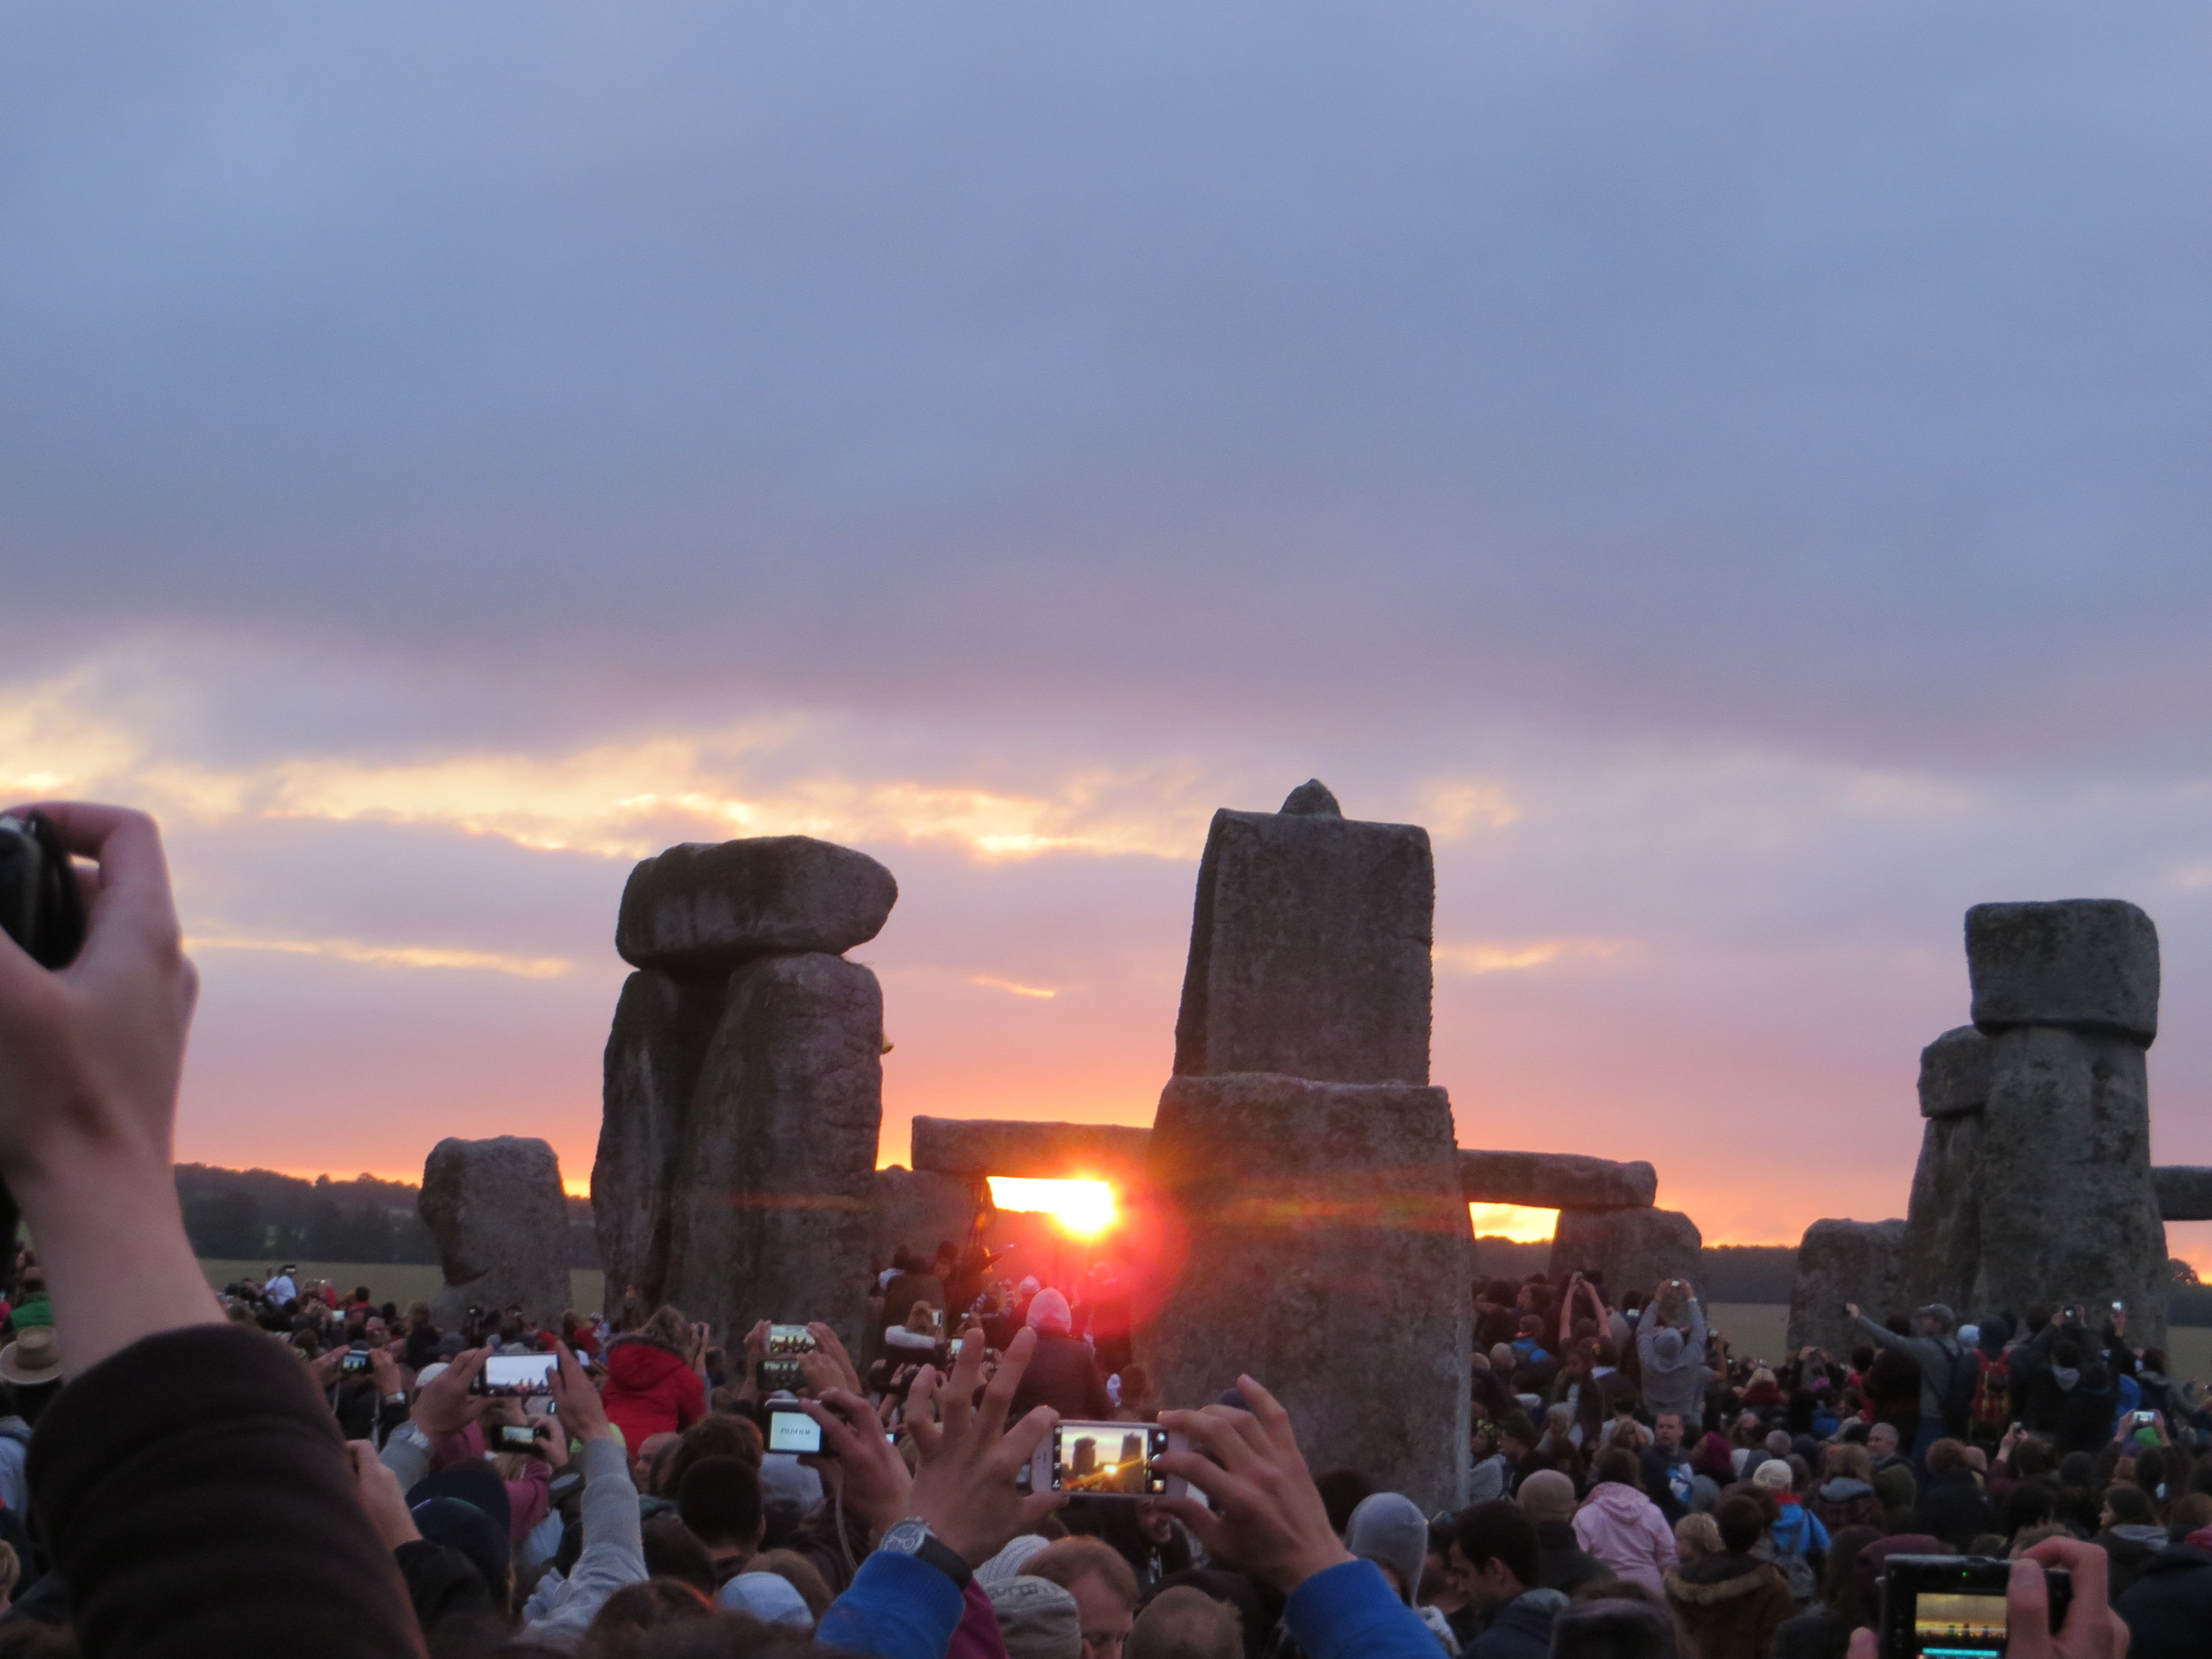 Sun rising at Stonehenge on 21 June 2015